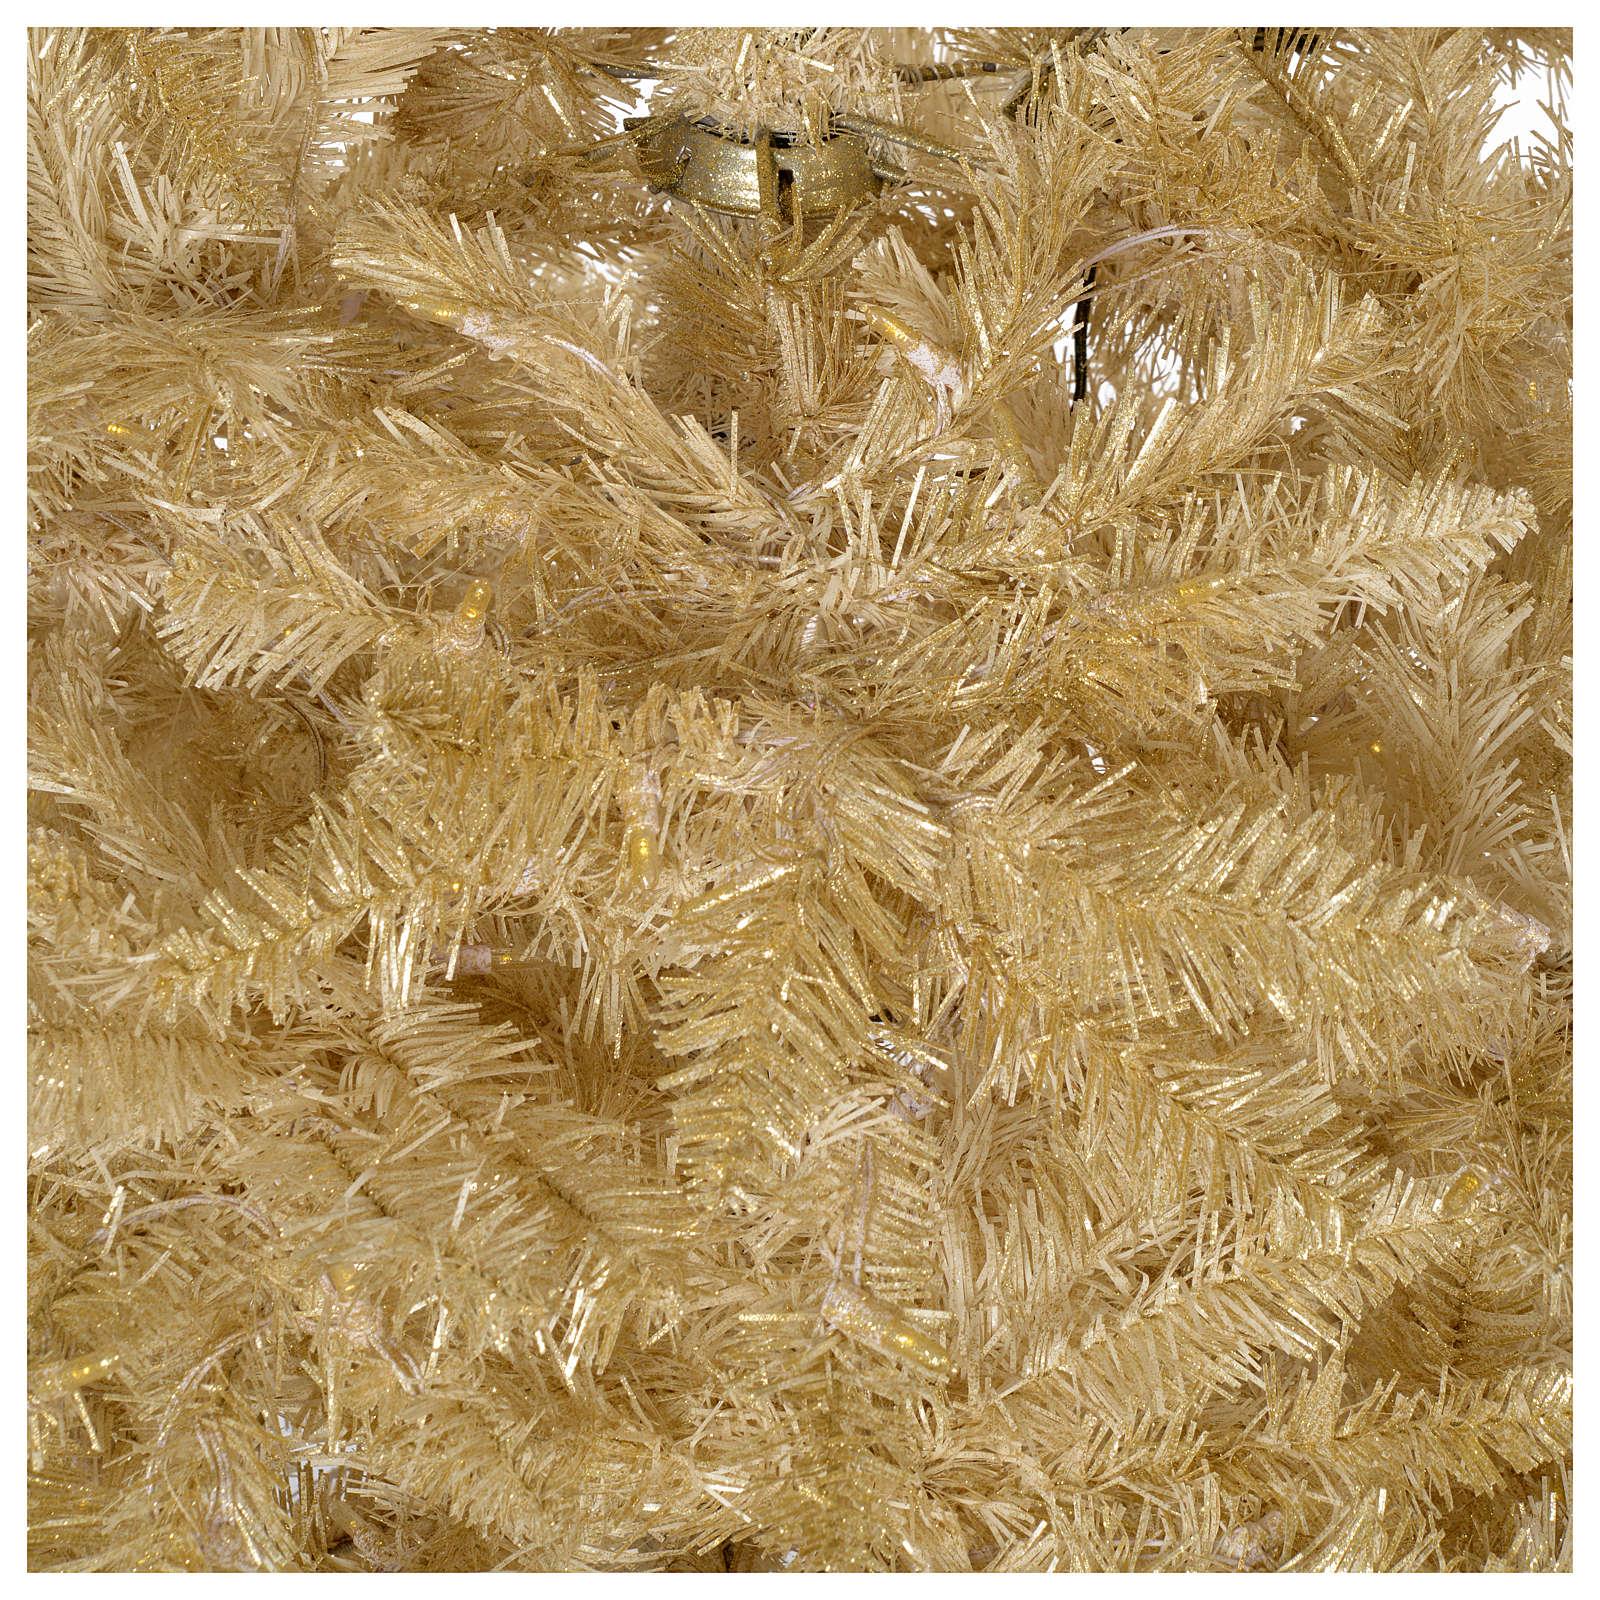 Árvore Natal 200 cm cor de marfim 400 luzes Led glitter ouro Regal Ivory 3